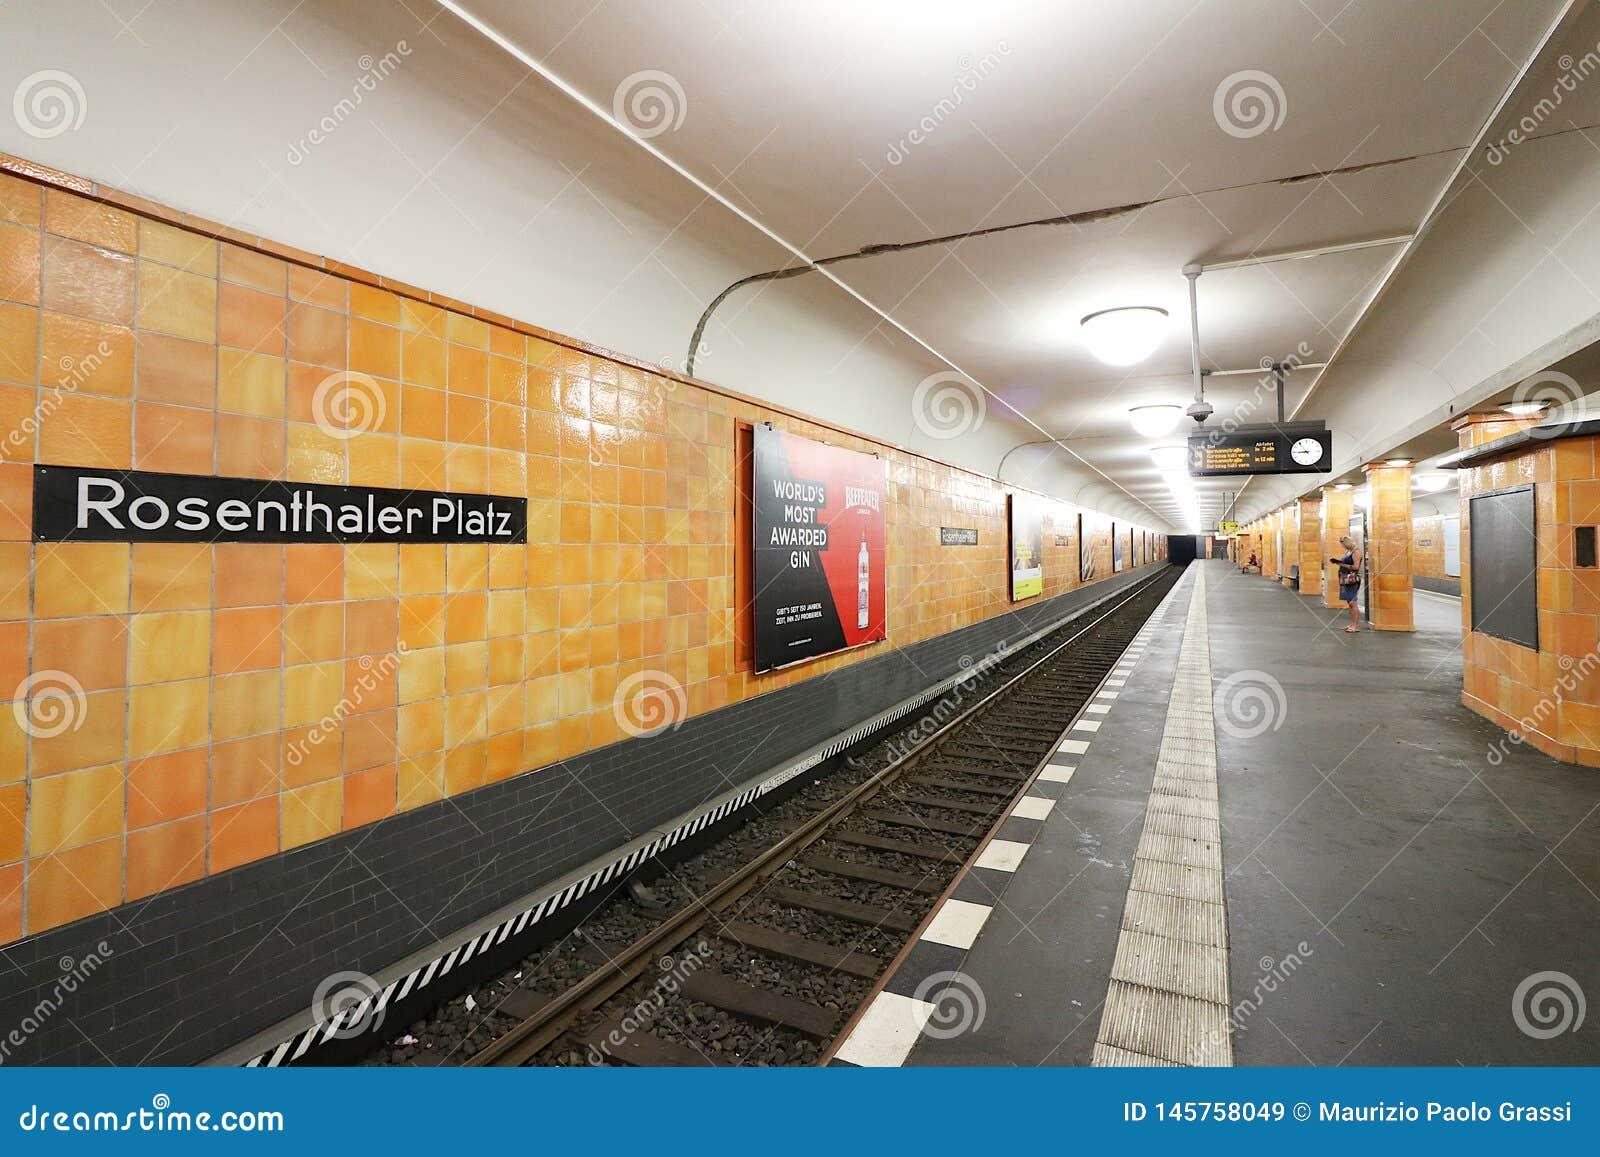 E Rosenthaler普拉茨傻事 在橙色陶瓷盖的墙壁